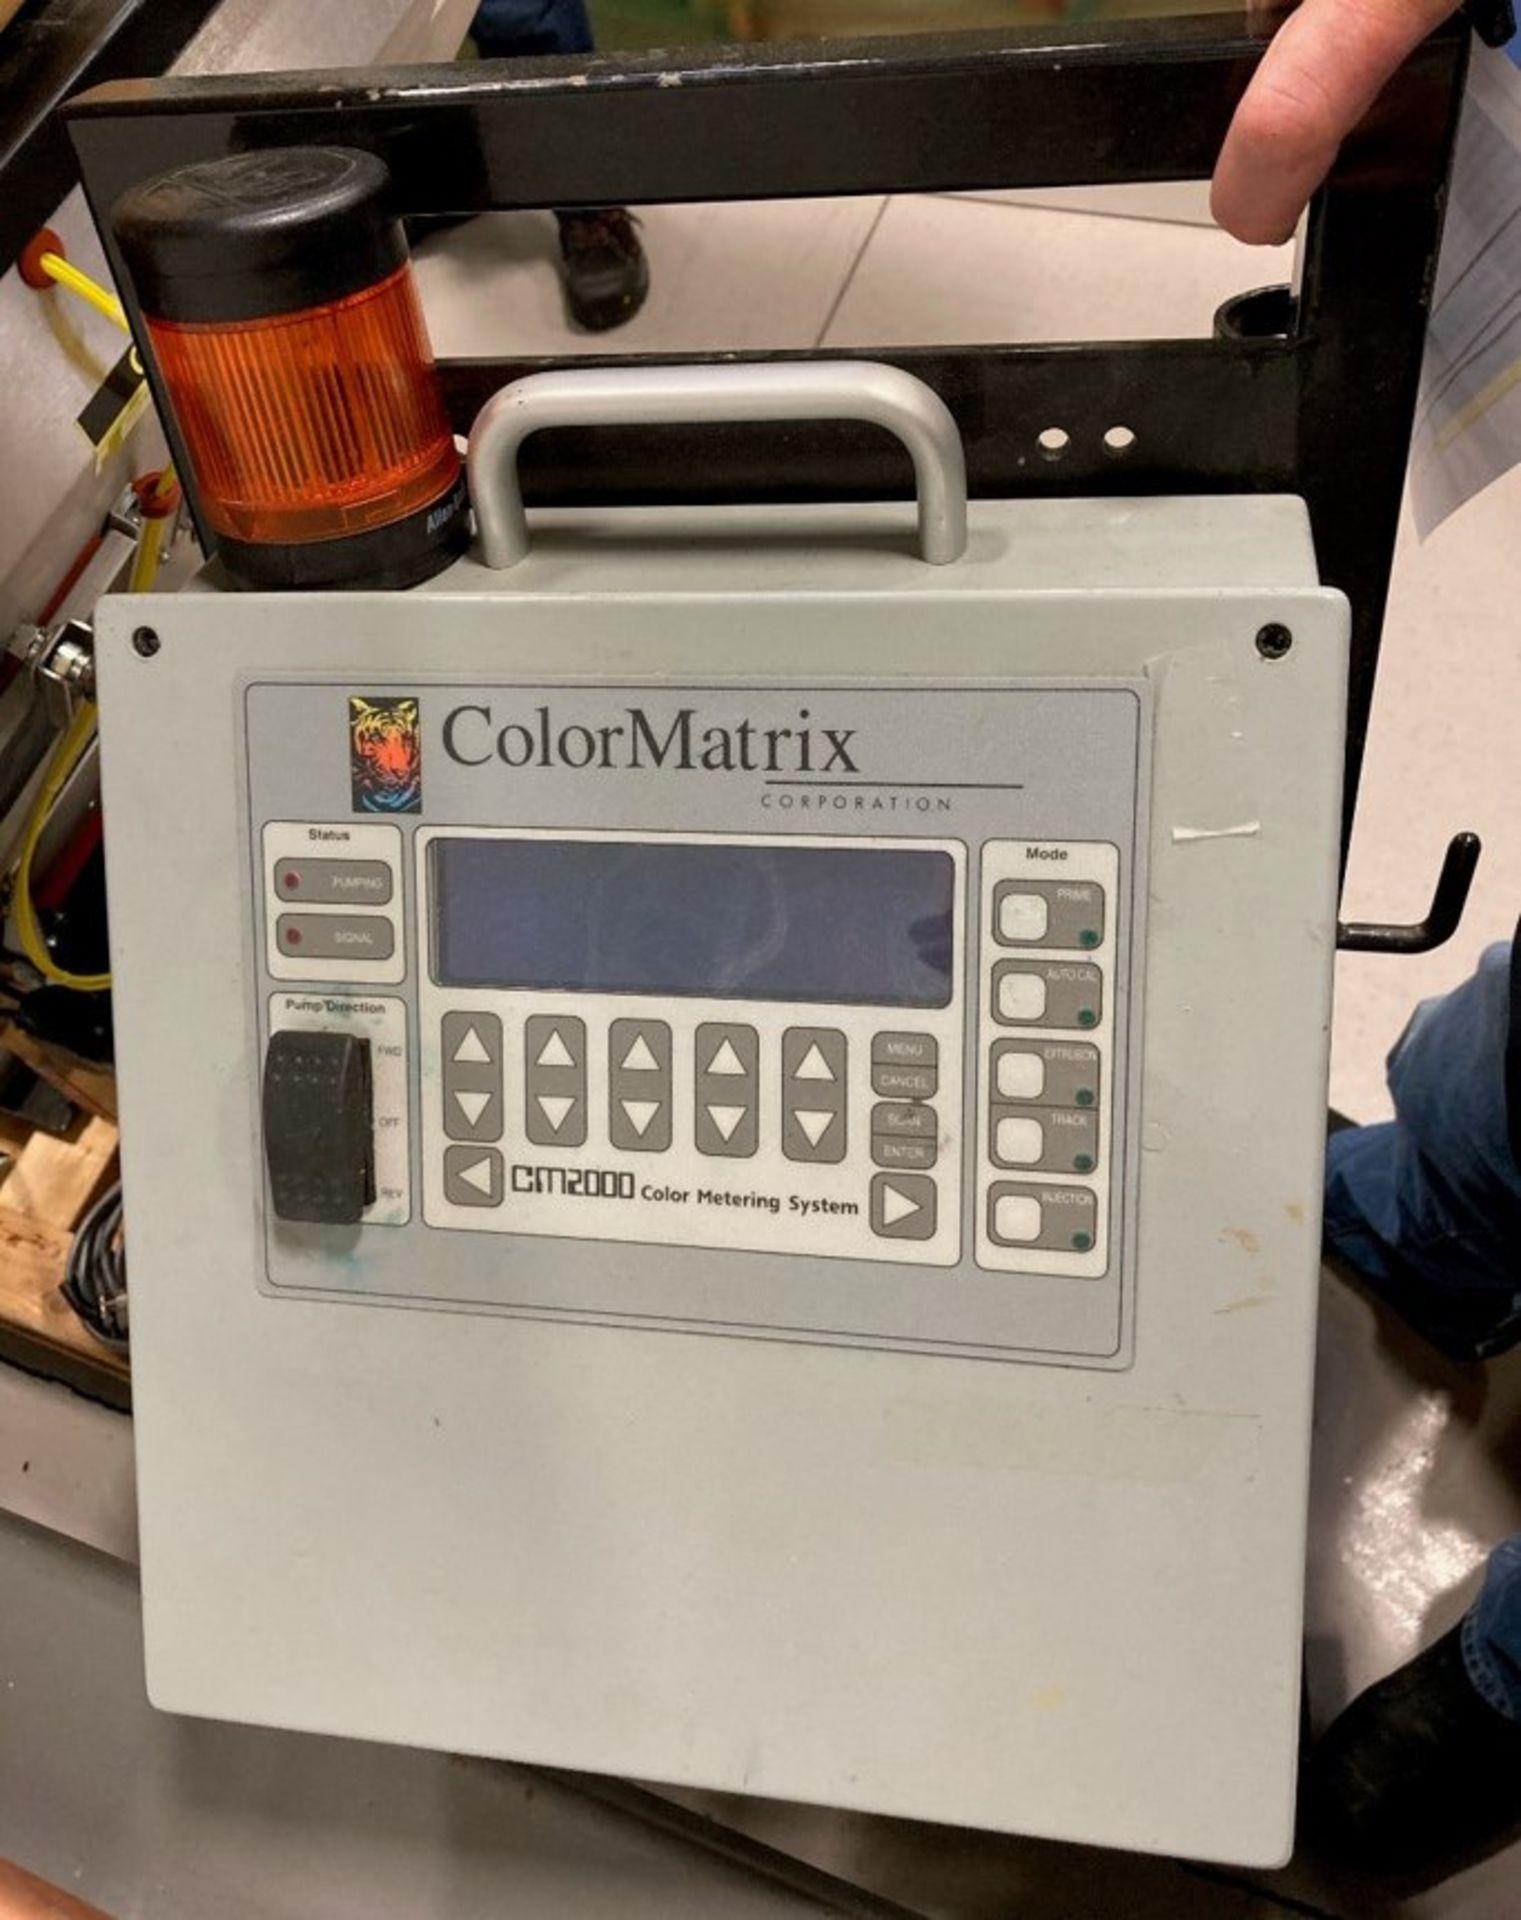 COLOR MATRIX CM2000 COLOR METERING SYSTEM, S/N: N/A [RIGGING FEES FOR LOT# 20B - $25 USD PLUS